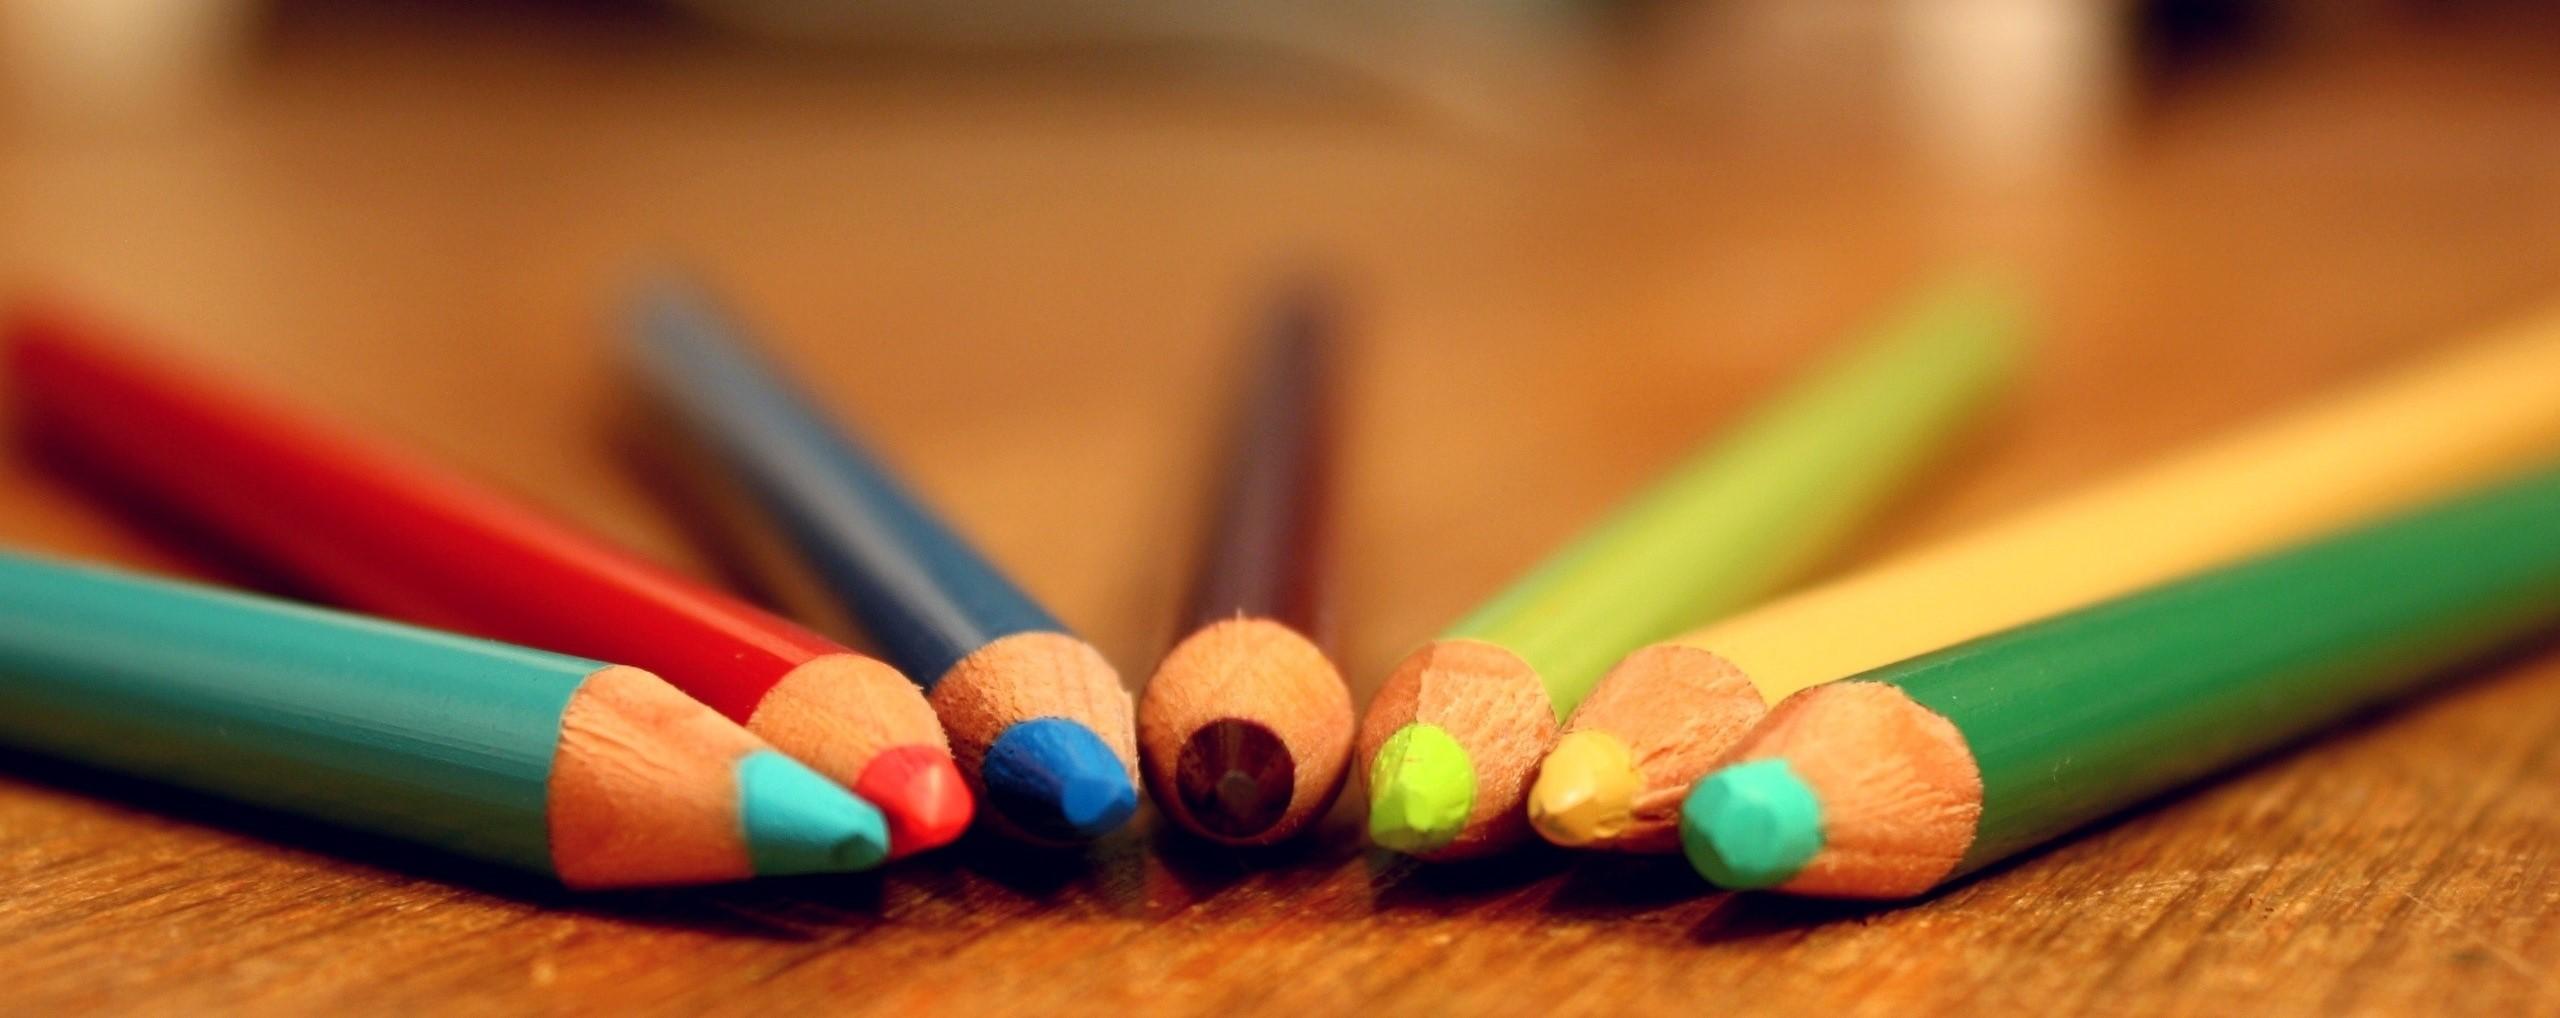 colorful-crayons-pencils-table-hazy_2560x1600(2)